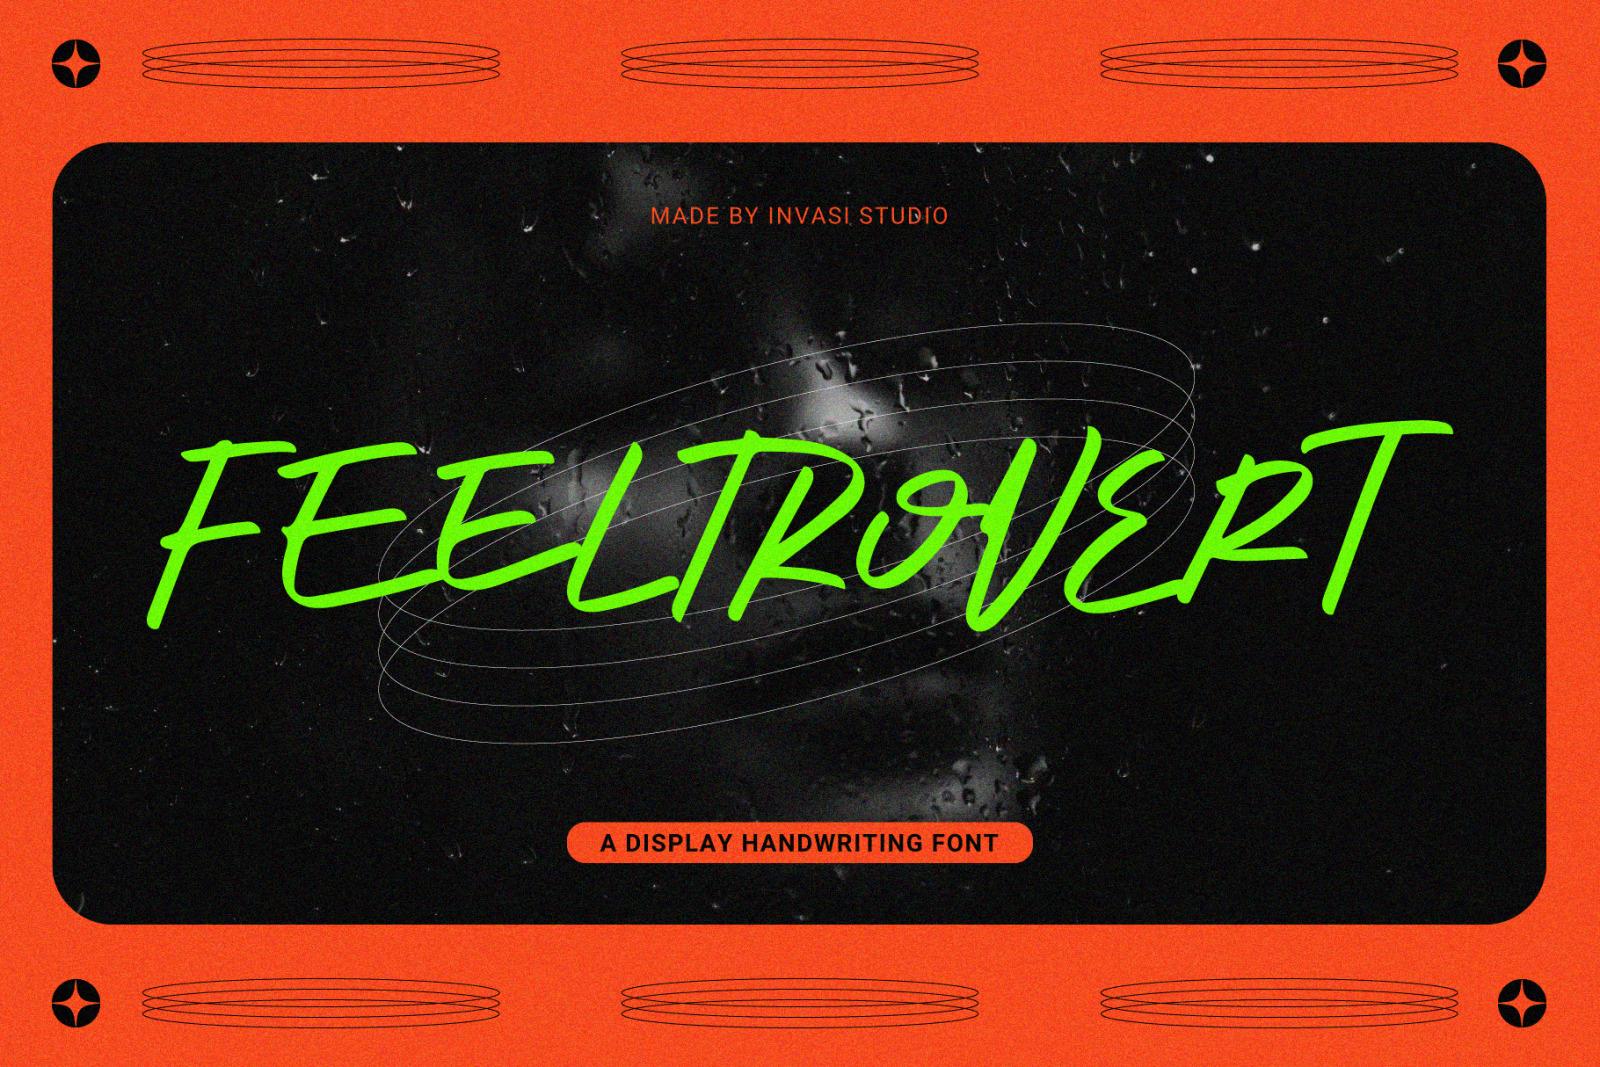 Feeltrovert - A Display Handwriting